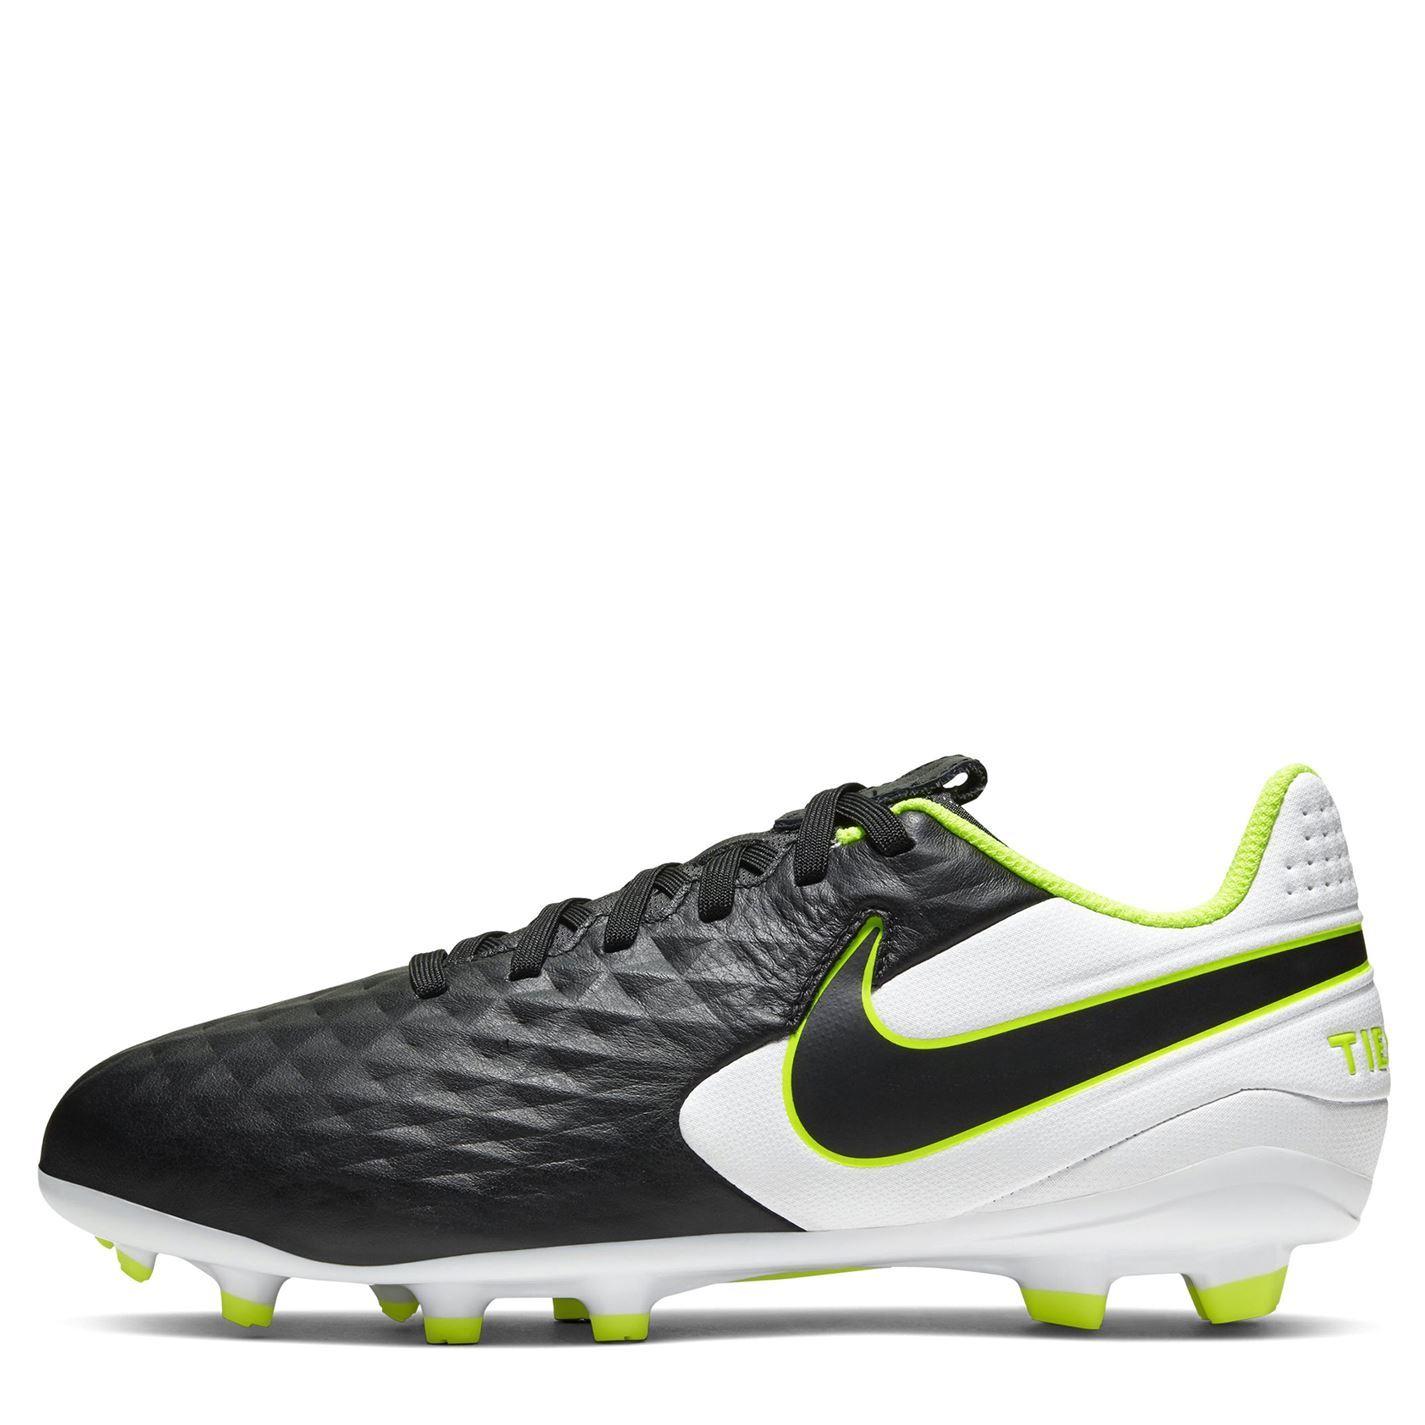 miniature 16 - Nike-Tiempo-Legend-Academy-Junior-FG-Firm-Ground-football-boots-Boys-Football